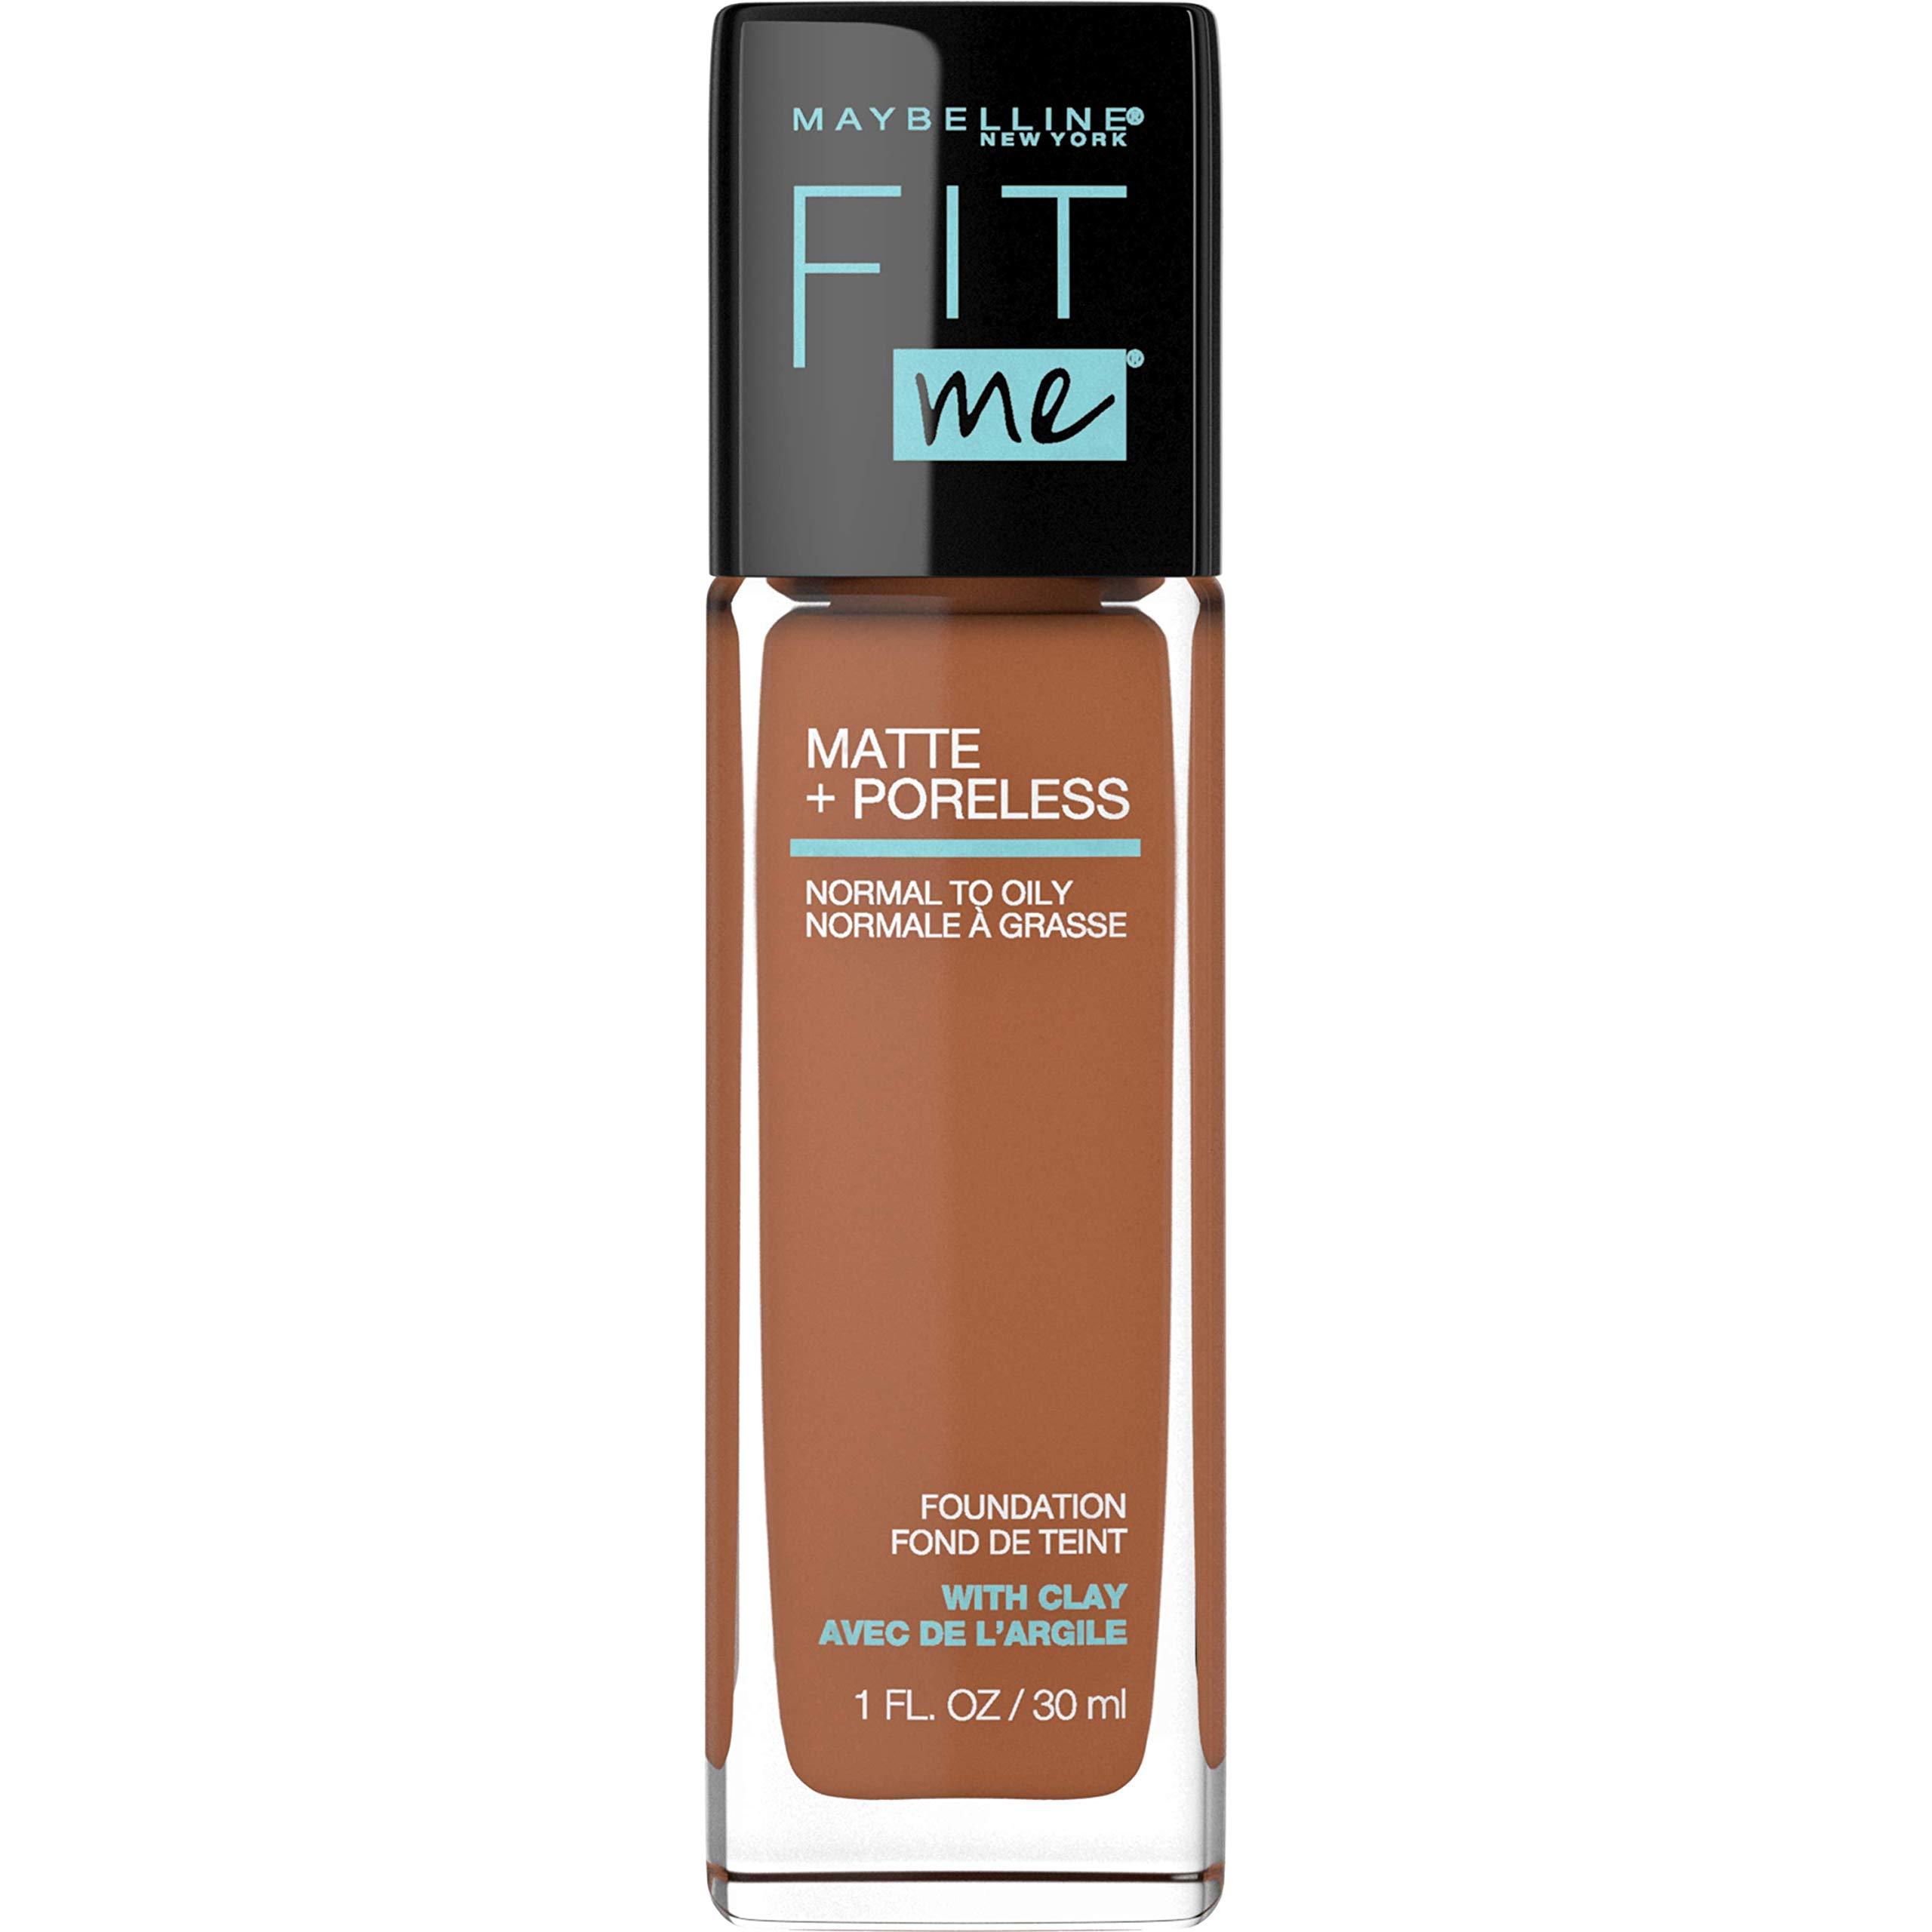 Maybelline Fit Me Matte + Poreless Liquid Foundation Makeup, Coconut, 1 fl. oz. Oil-Free Foundation